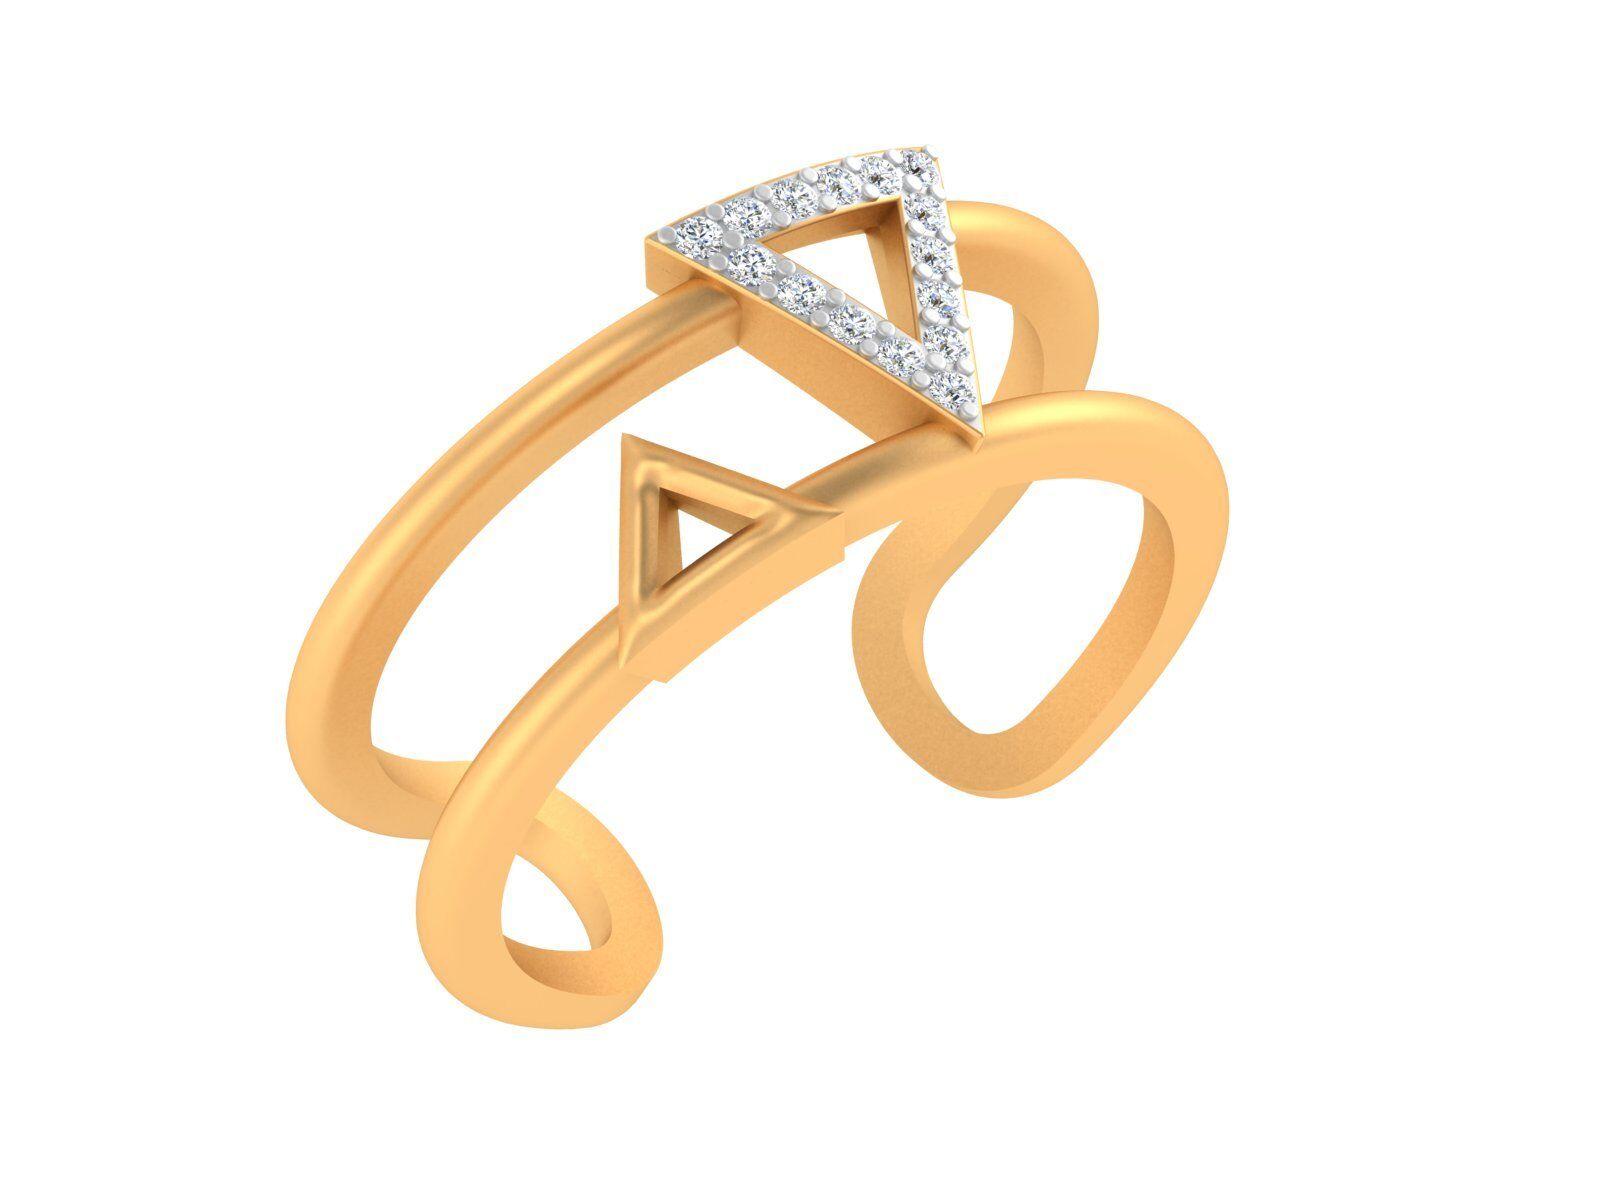 10k Real gold SGL SI-IJ Round Brilliant Cut Diamond Trillion Double Loop Ring